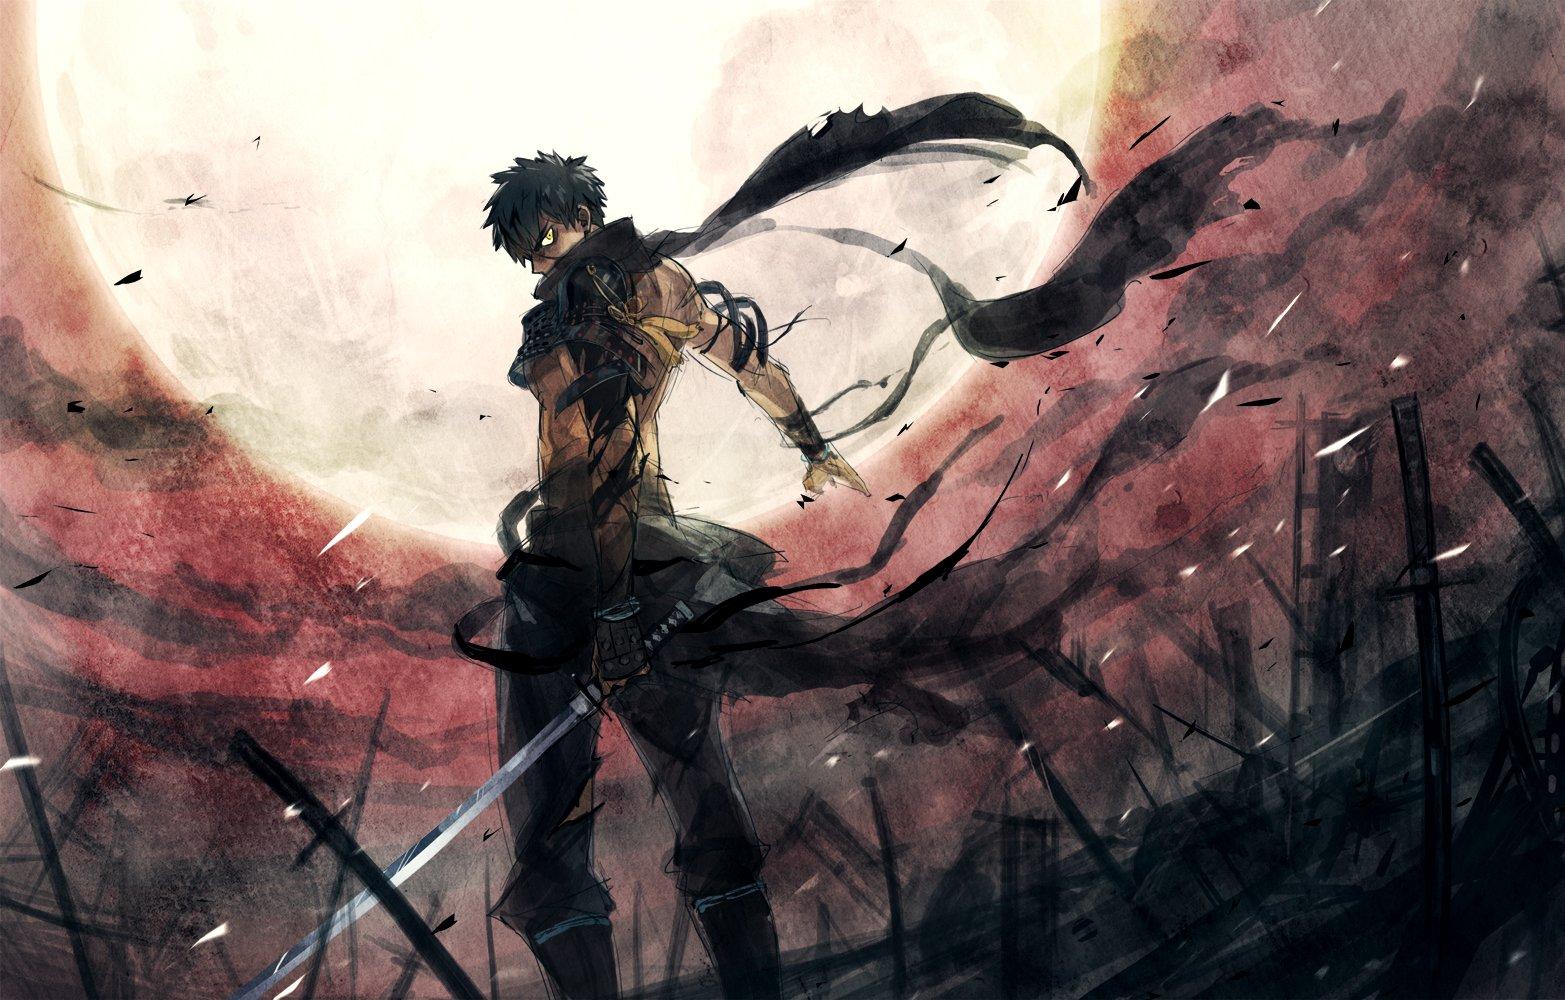 Anime warrior wallpaper wallpapersafari - Anime war wallpaper ...